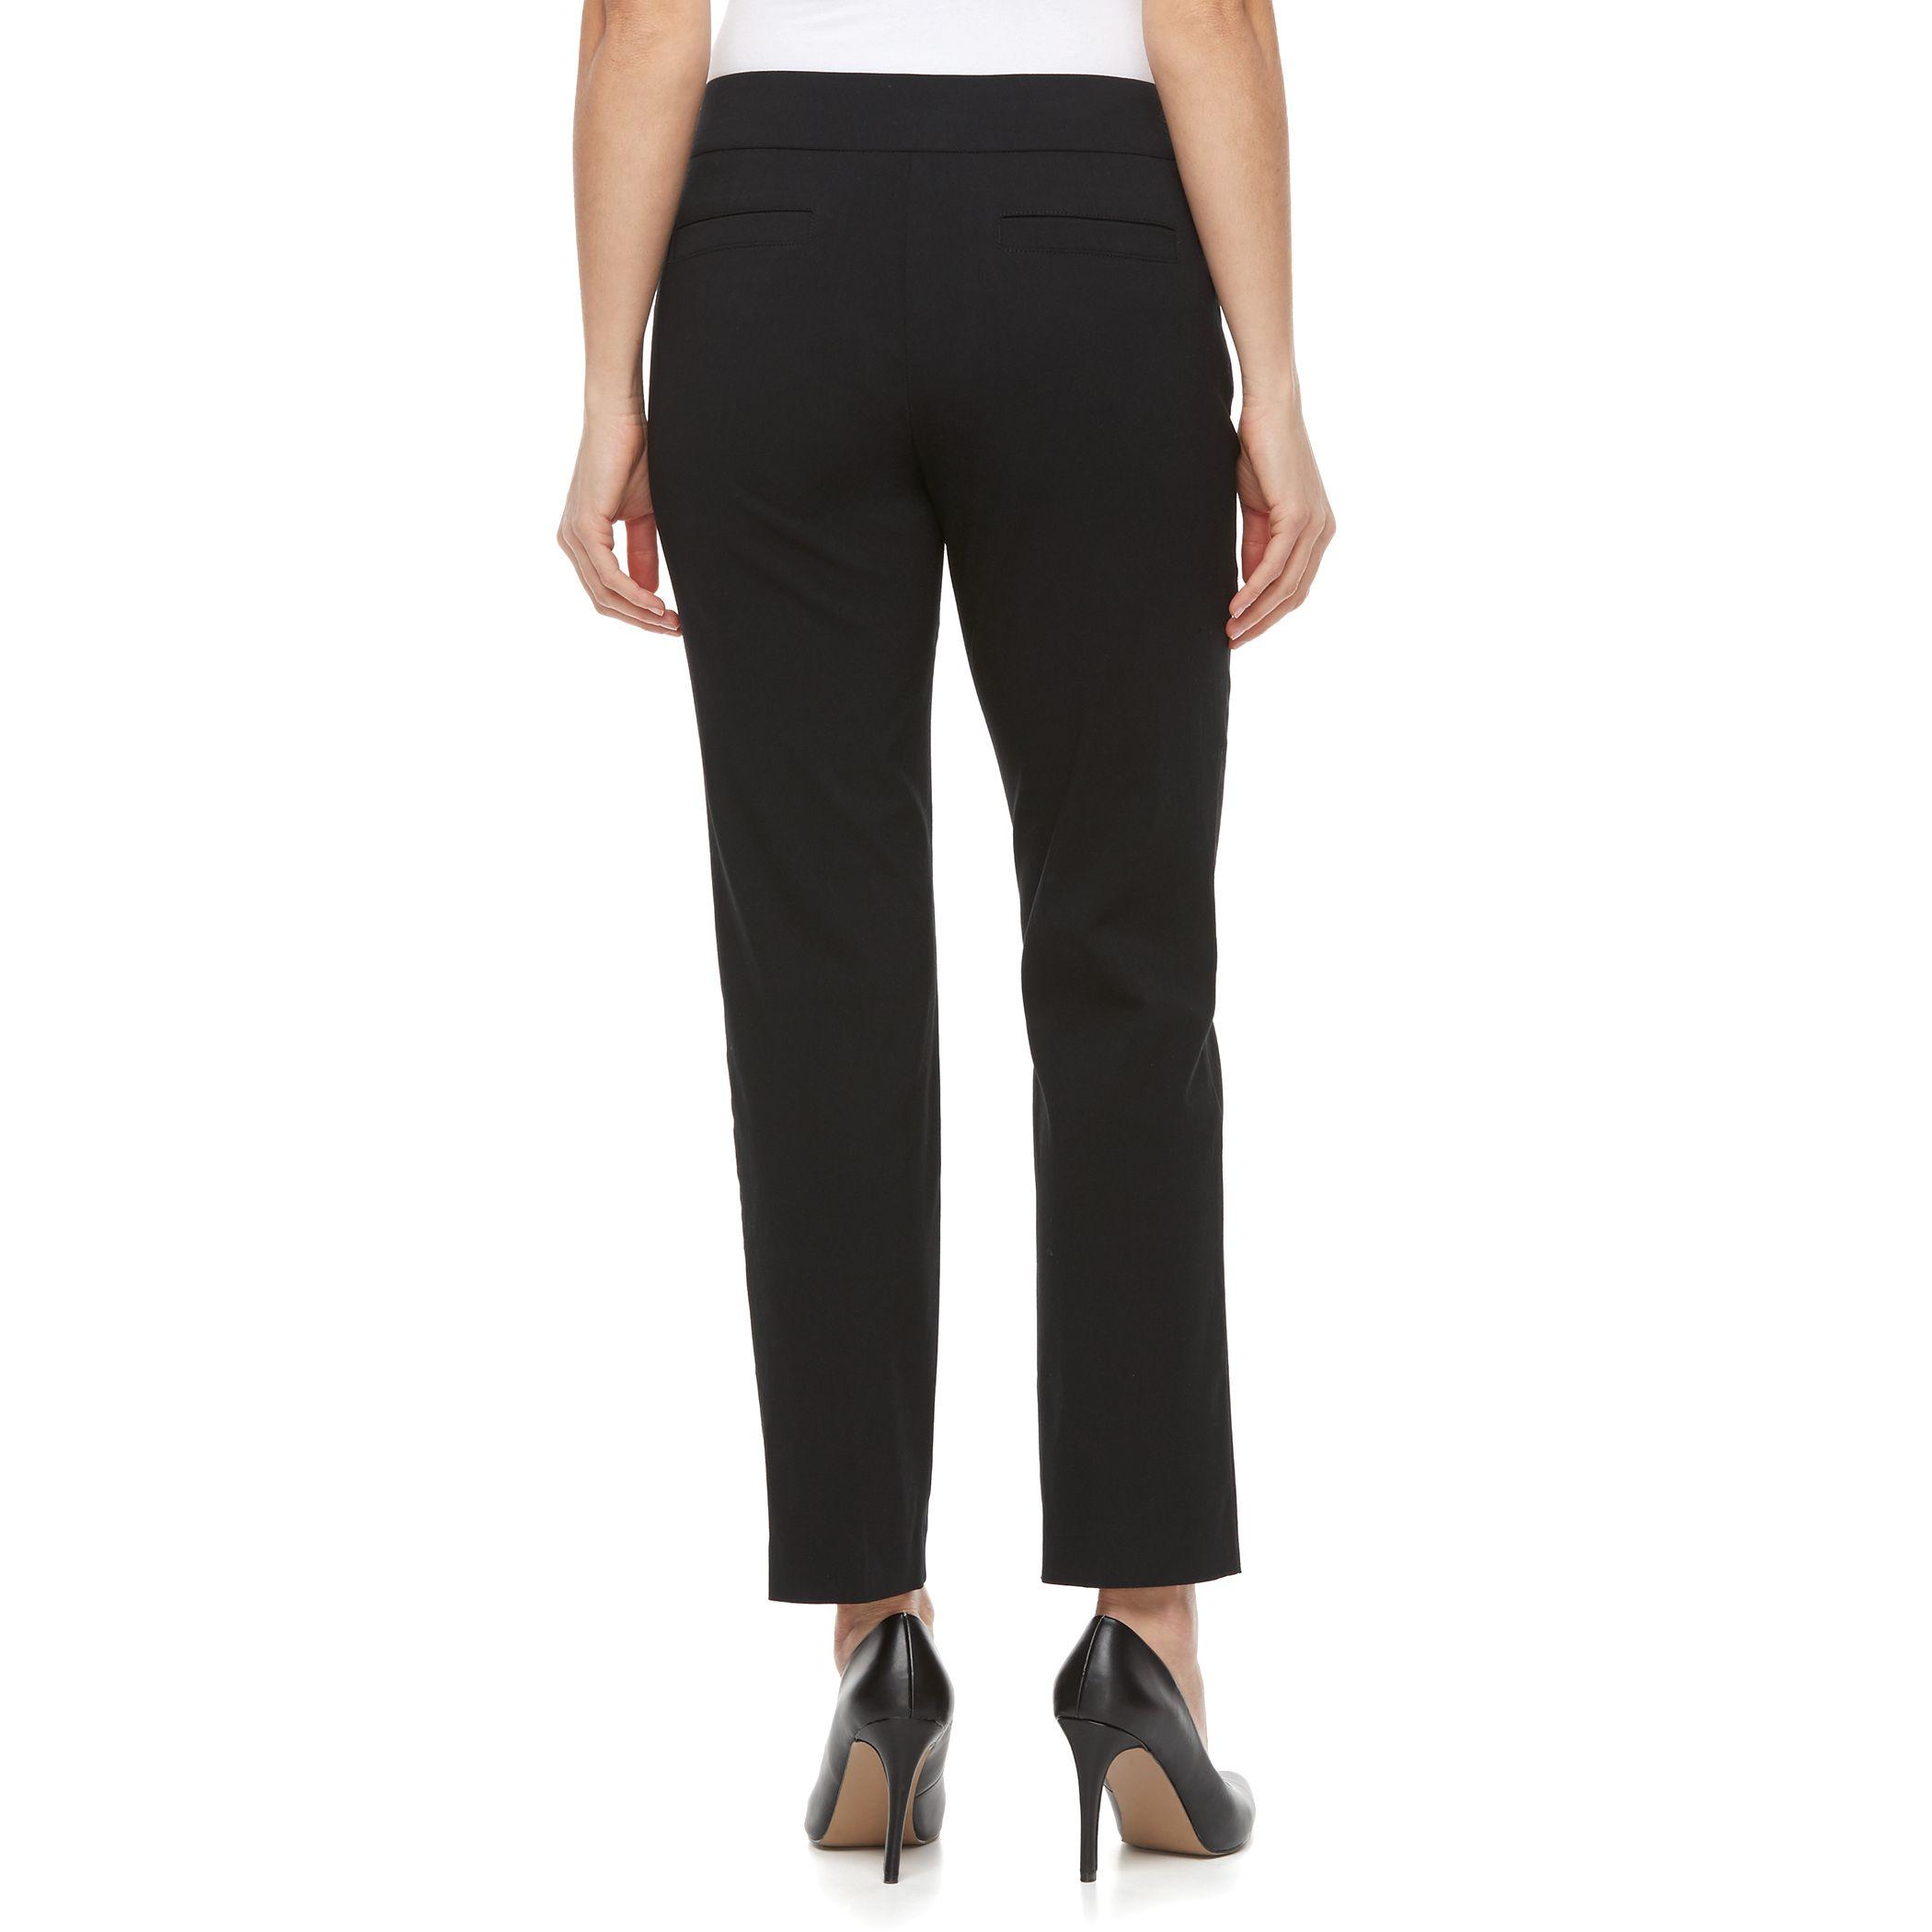 Womens Briggs Pants Bottoms Clothing Kohls